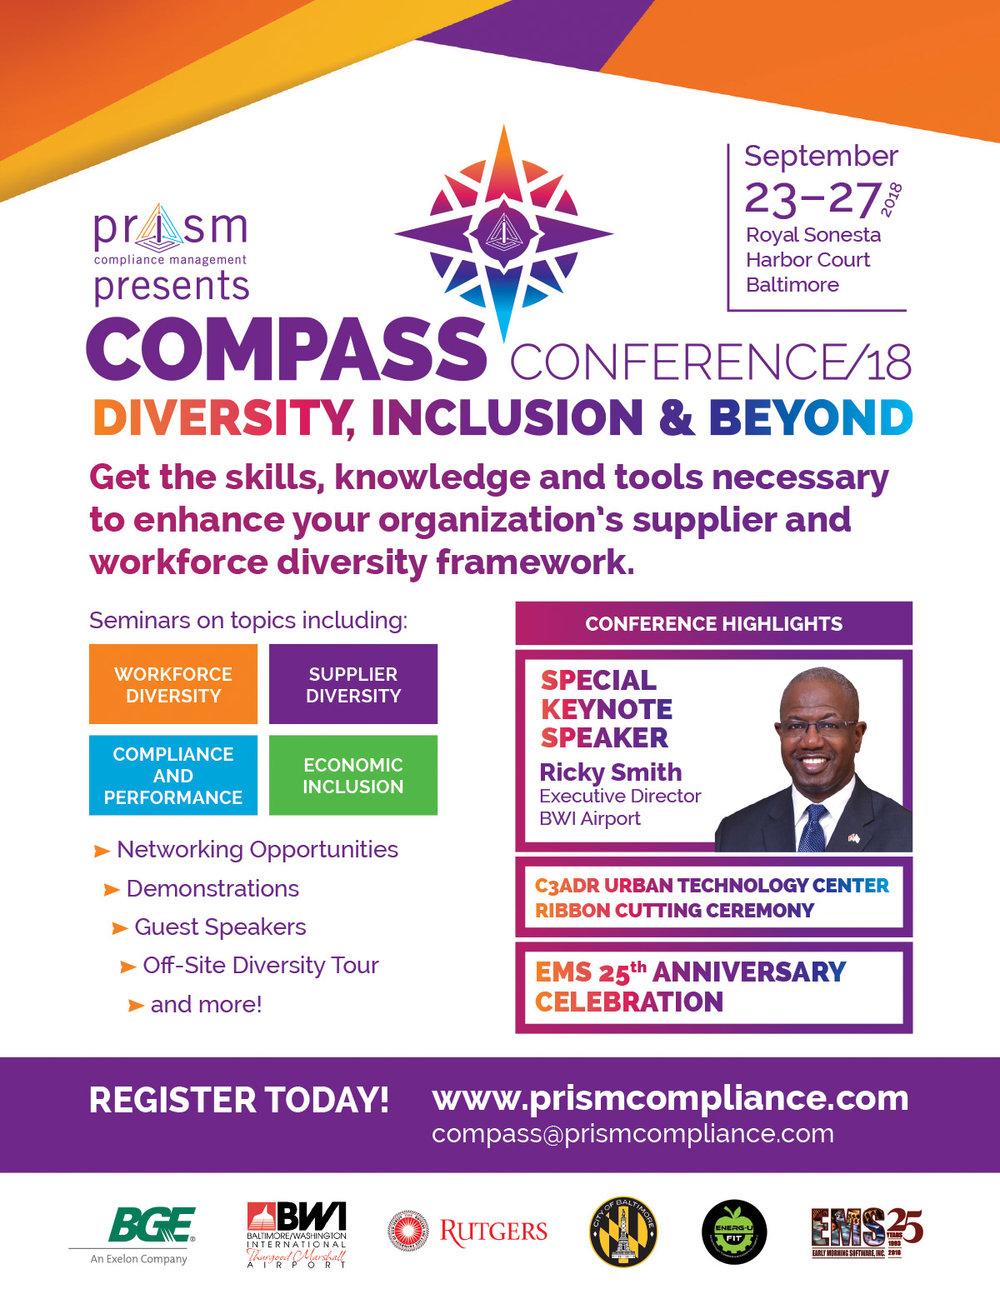 COMPASS+Diversity+Conference+Flier+2018.jpg